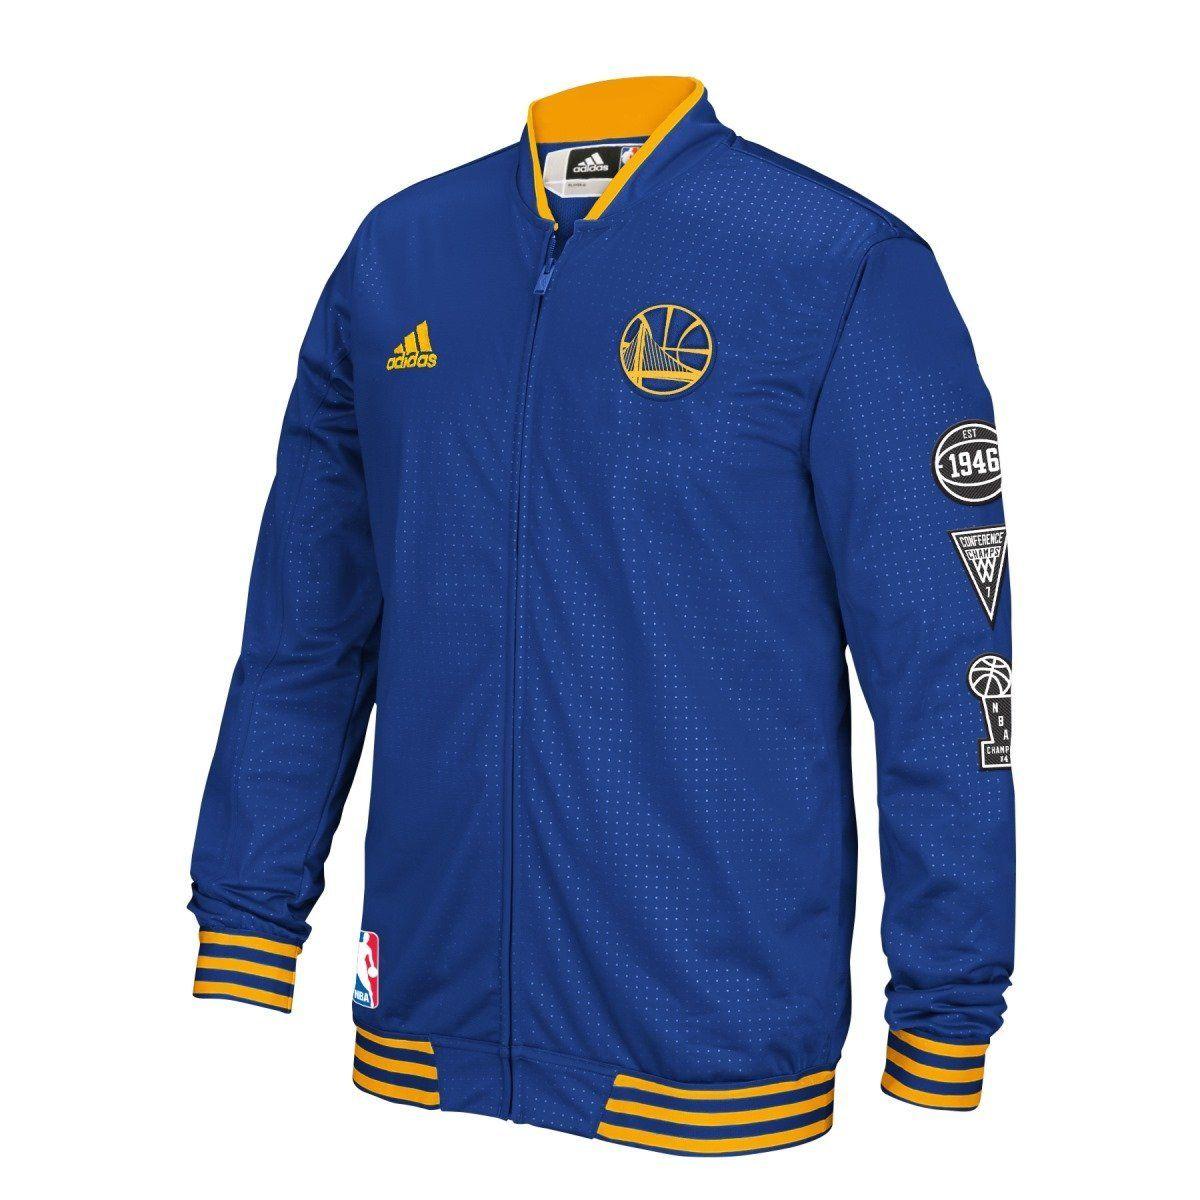 Amazon.com   Golden State Warriors Adidas 2015 NBA Men s On-Court Warm-Up  Full Zip Jacket   Sports   Outdoors d0b8a846e